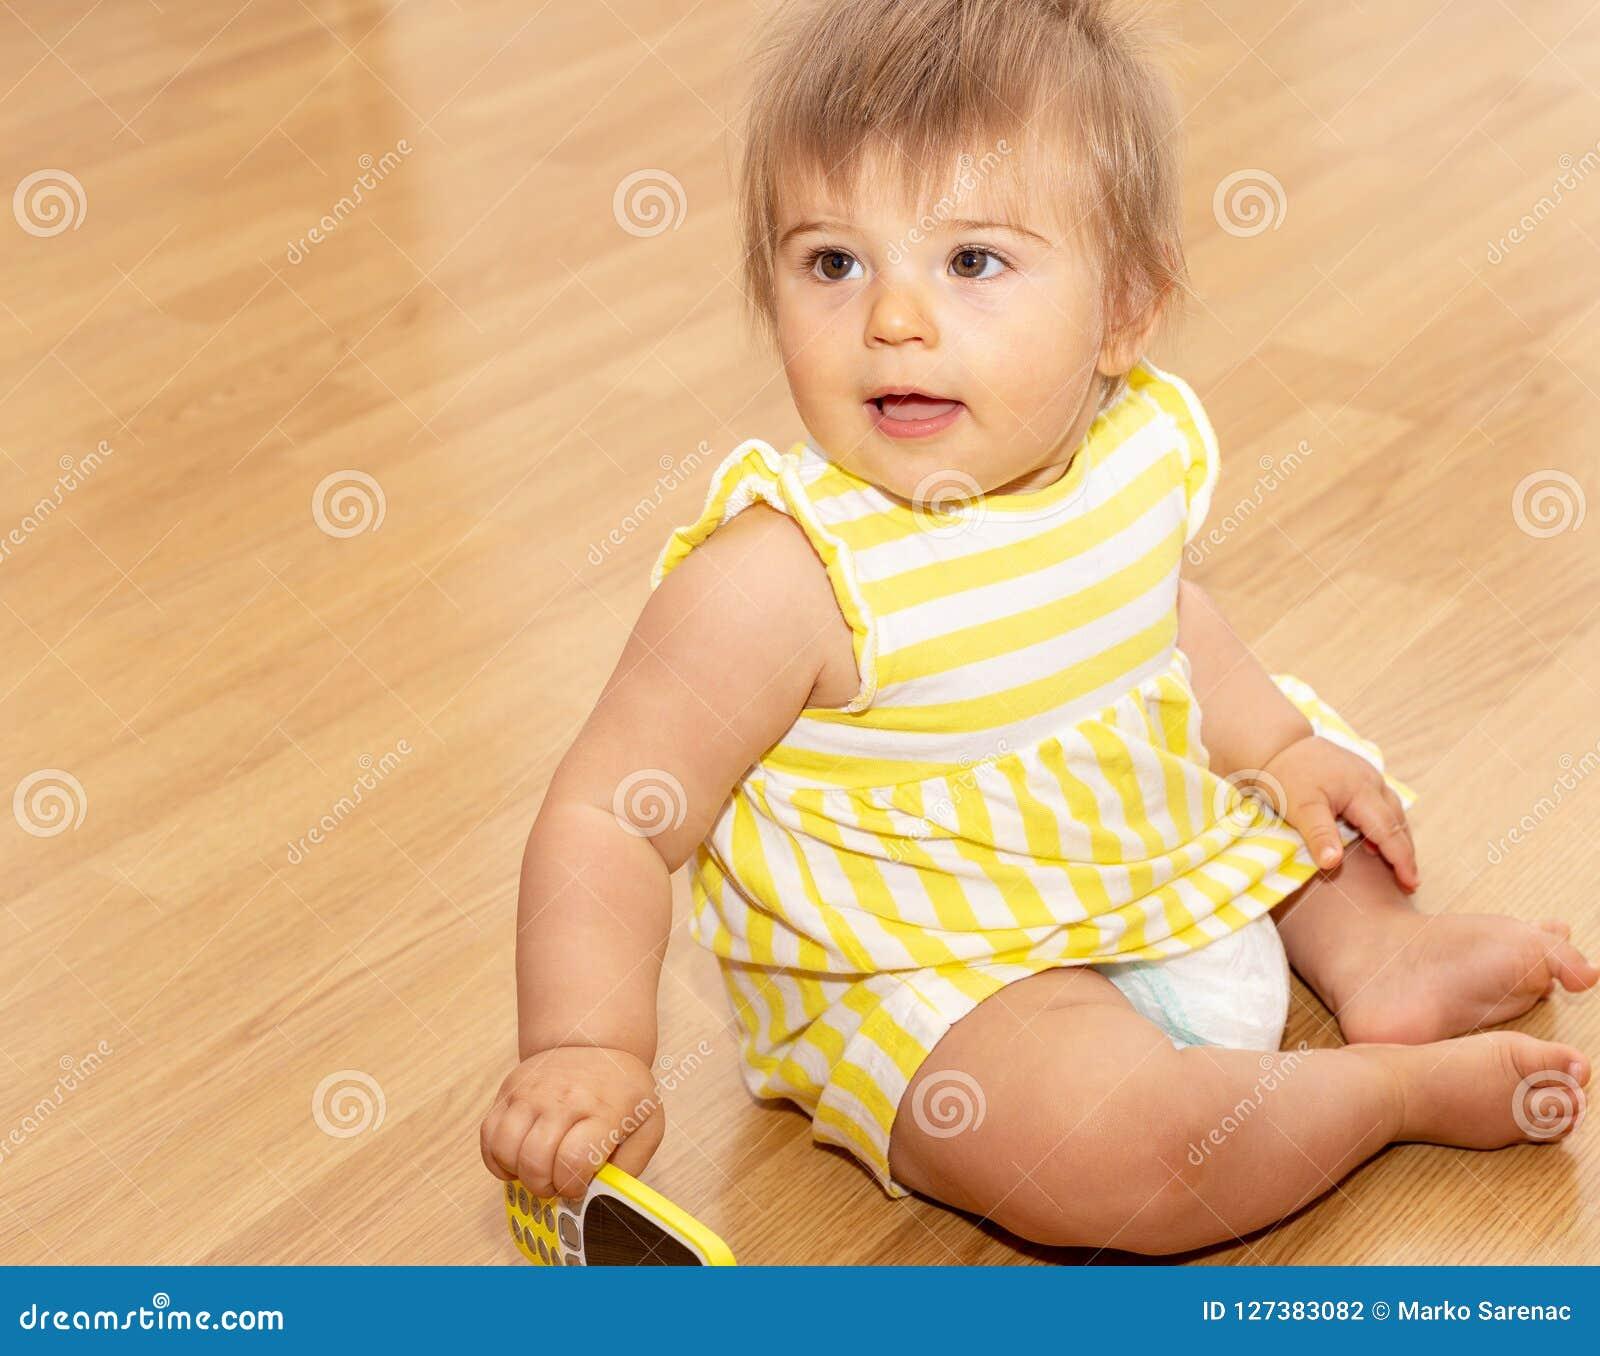 Baby Girl Phone Yellow Dress Cute 4 Stock Photo Image Of Happy Infant 127383082